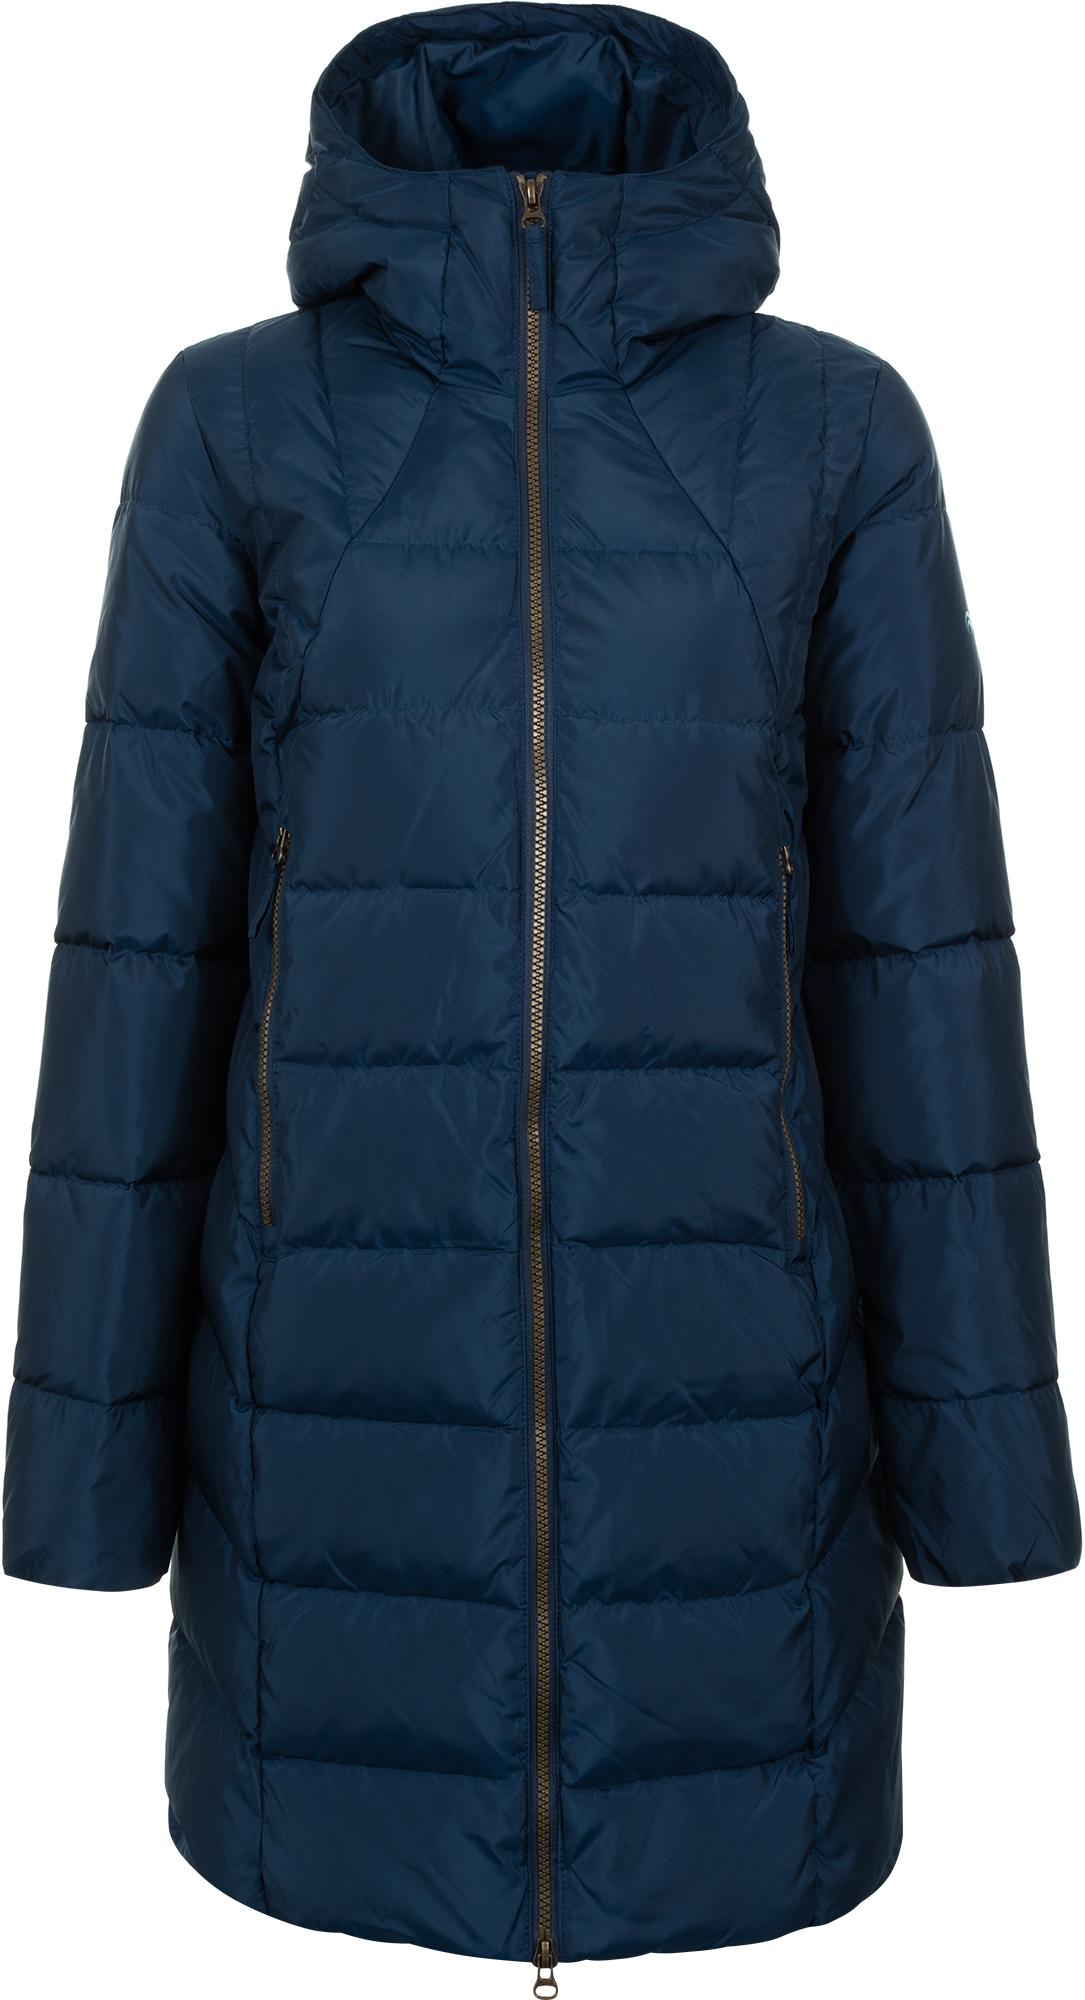 Outventure Куртка пуховая женская Outventure, размер 42